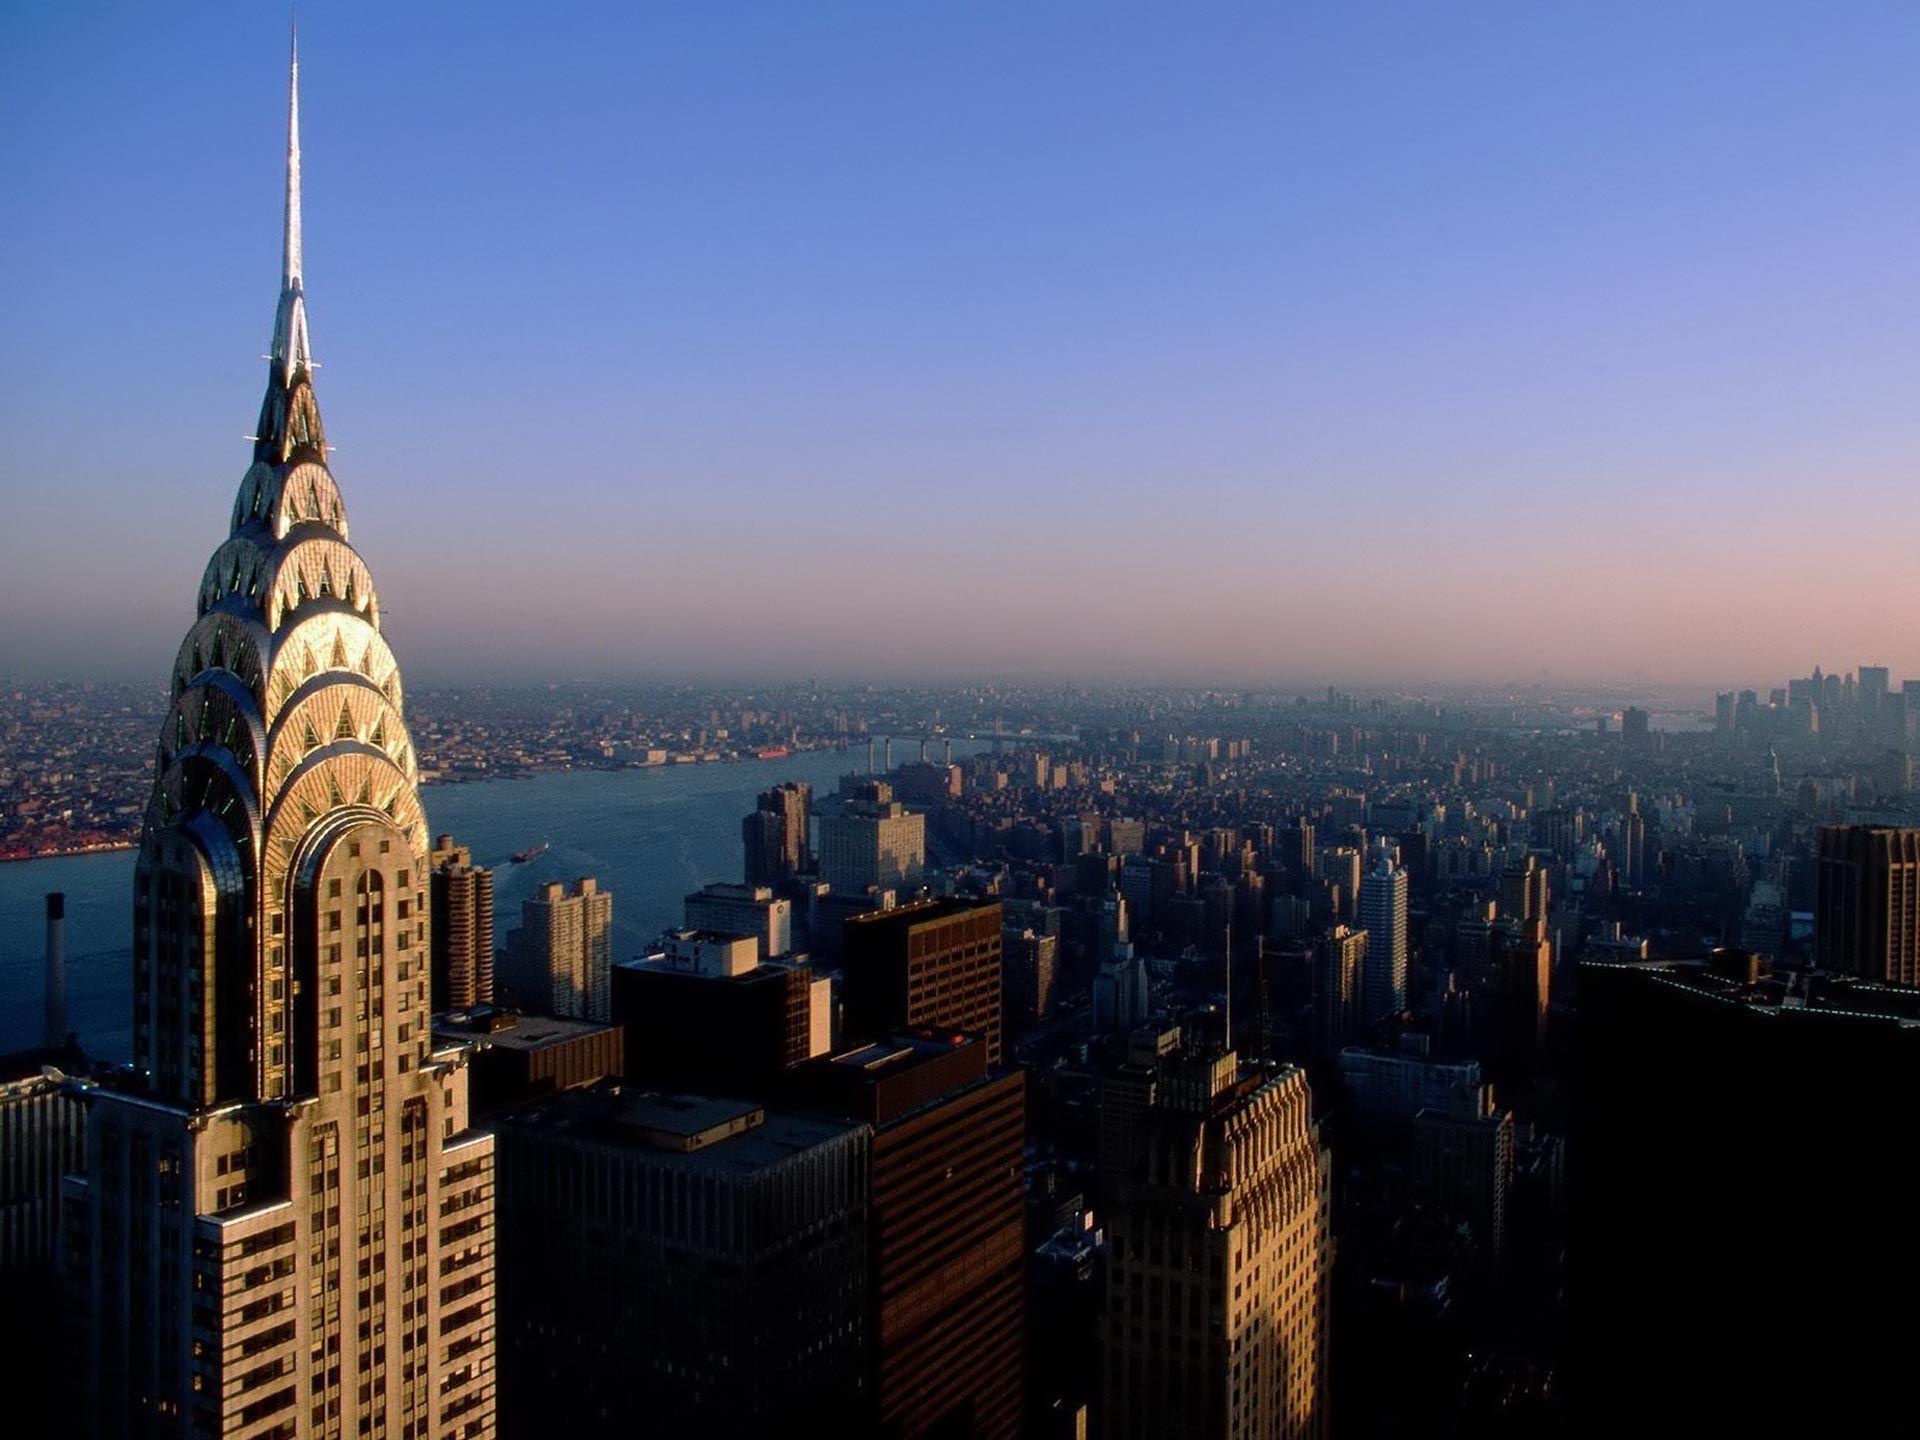 New York City Hd Wallpaper Chrysler Building Empire State